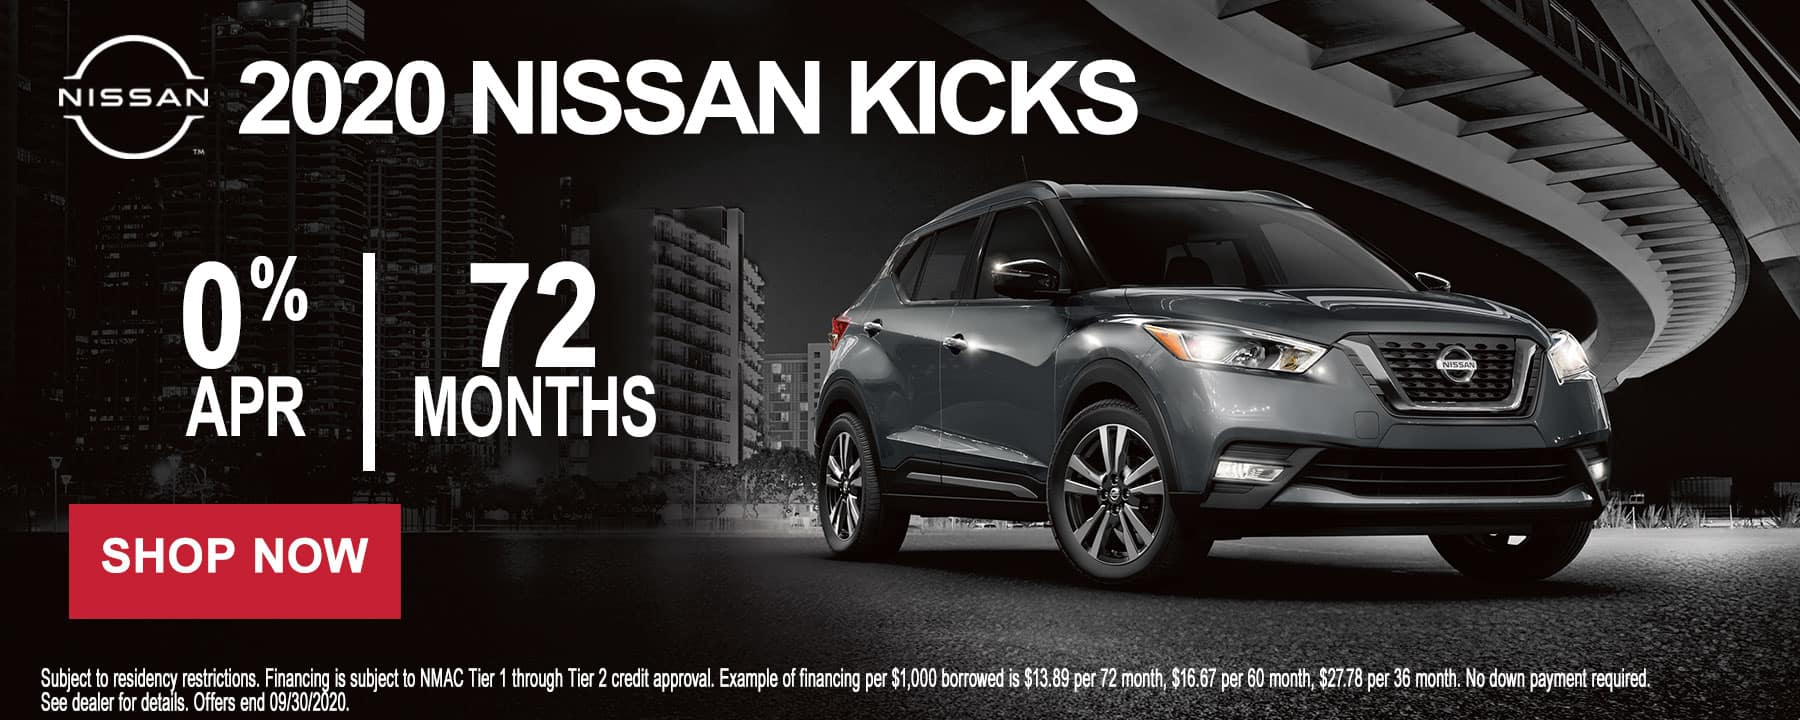 2020 Nissan Kicks September Offer at Star Nissan